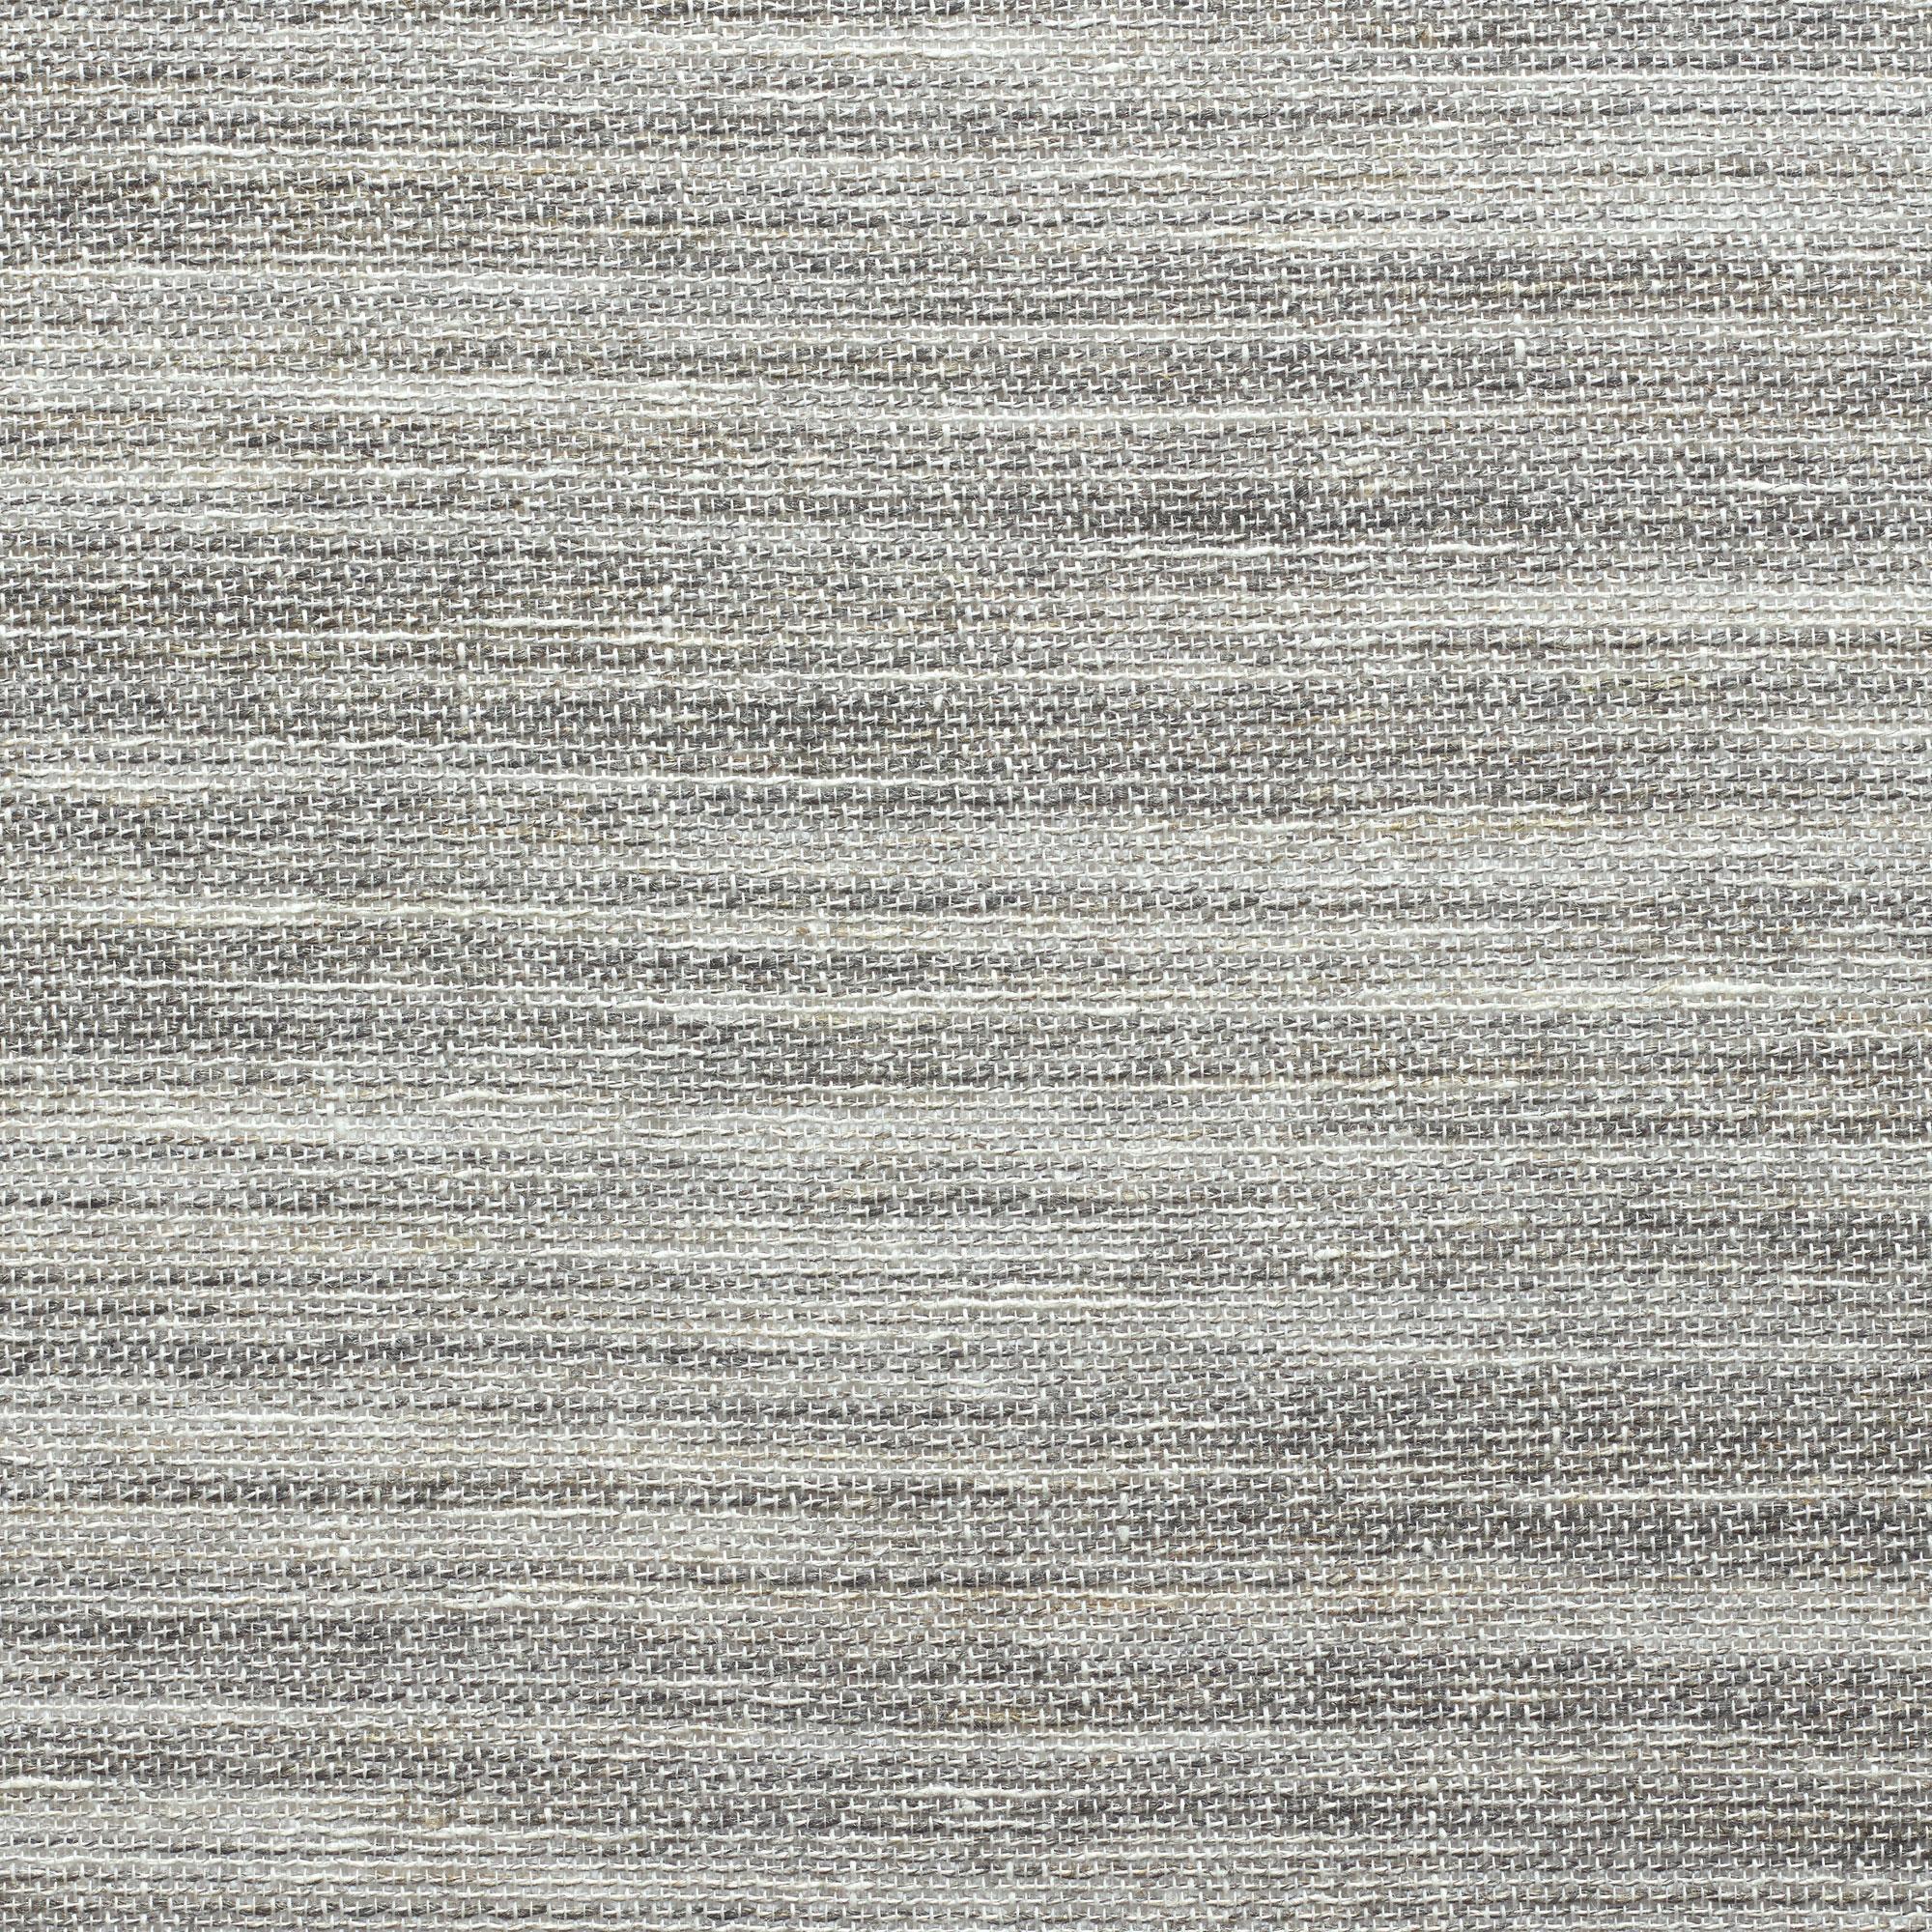 swatch-EW104-60-weathered-graystone-web.jpg